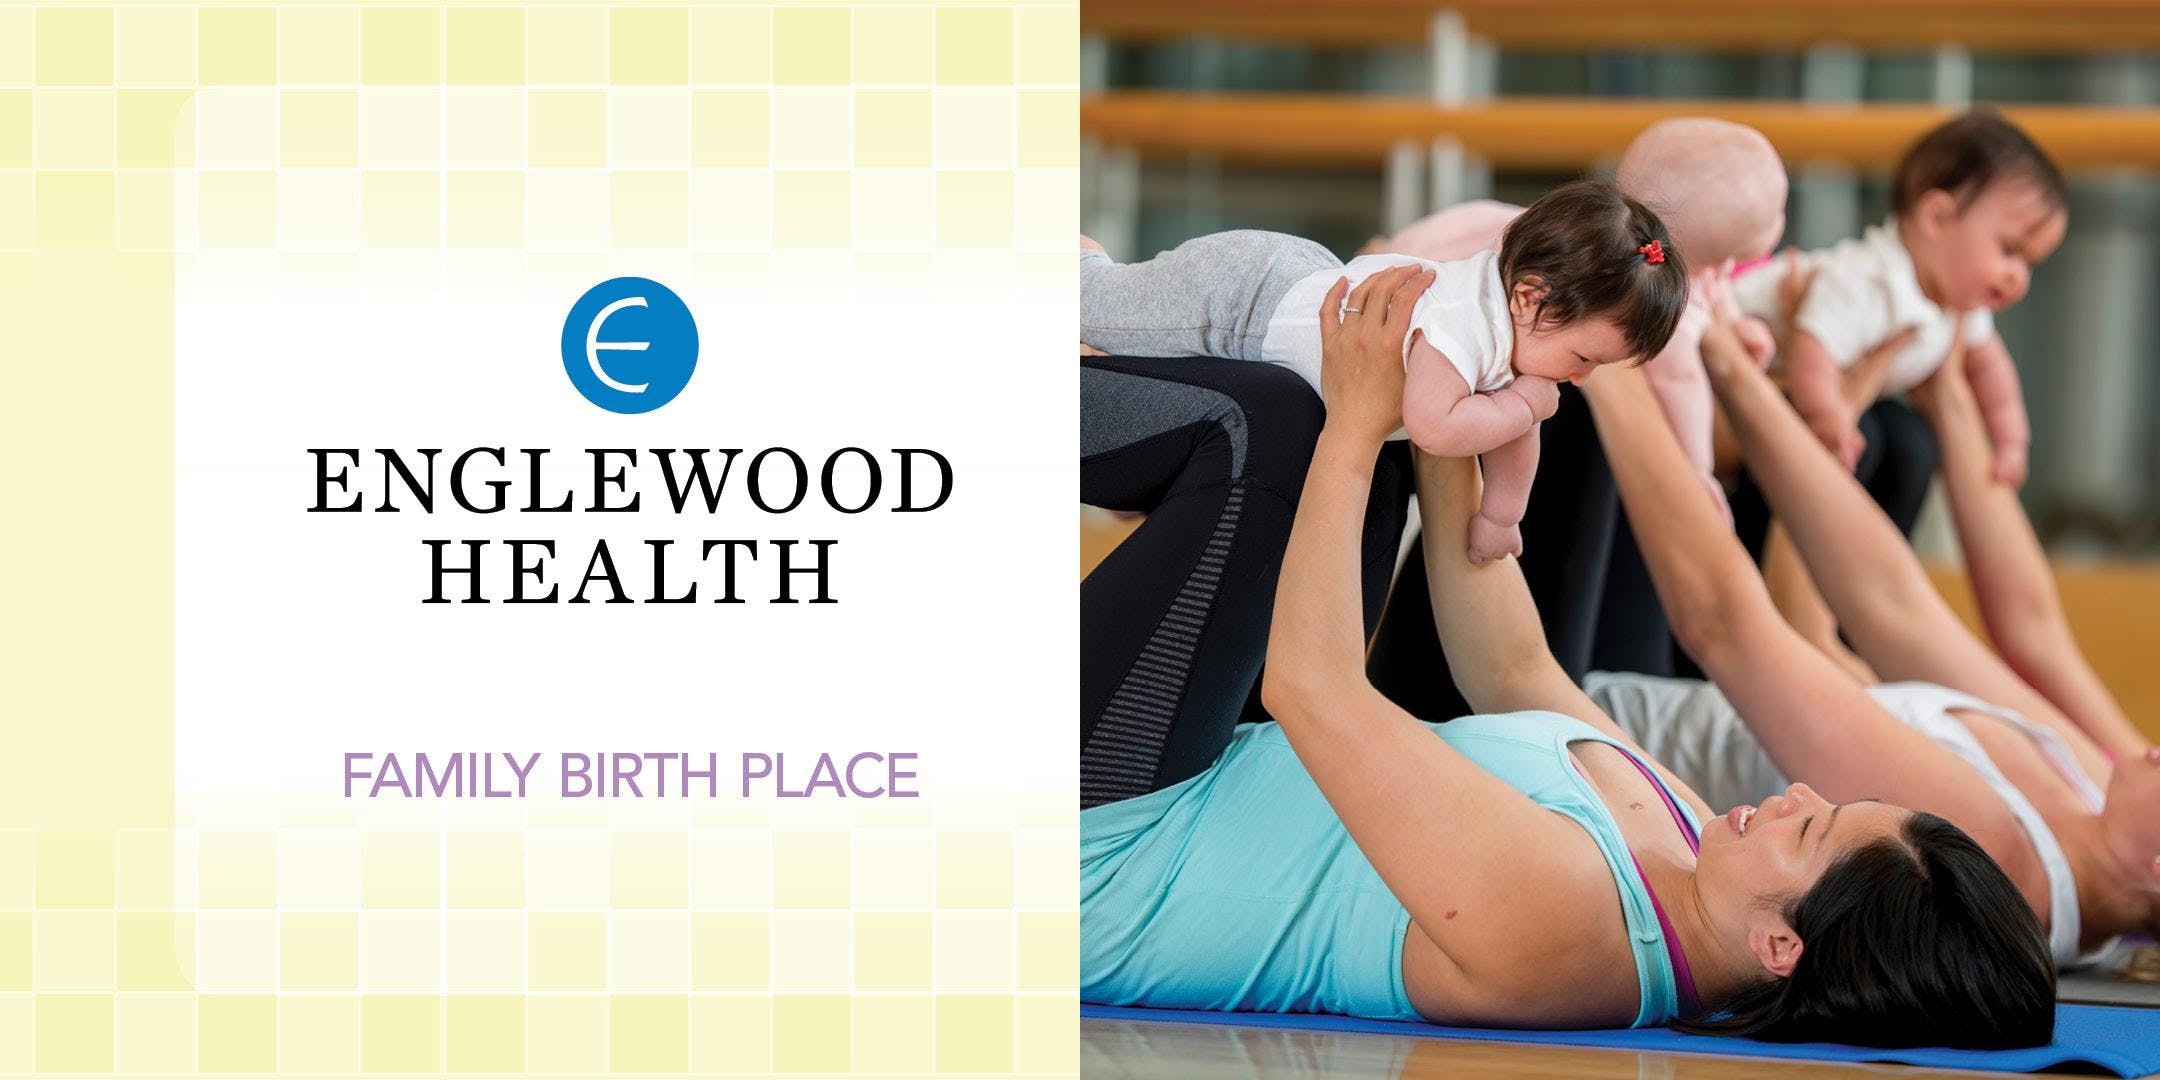 More info: Mommy and Me Postnatal Yoga Series (NOV 1-DEC 13)